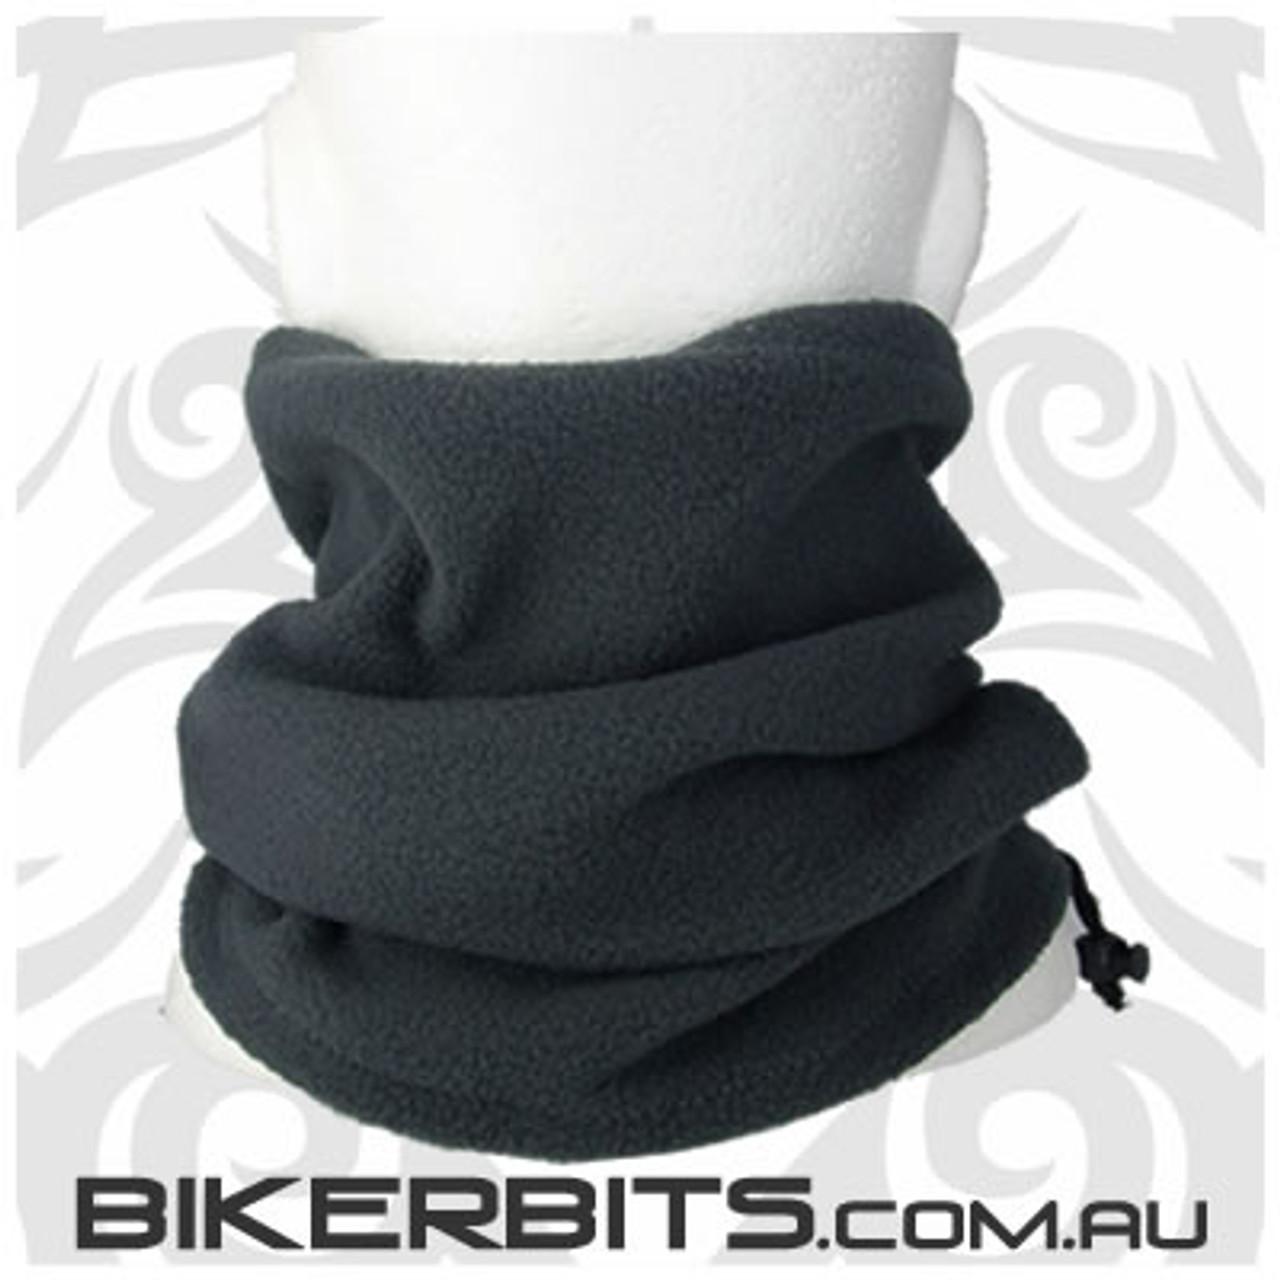 Headwear - Fleece Neck Warmer - Single Layer - Dark Grey